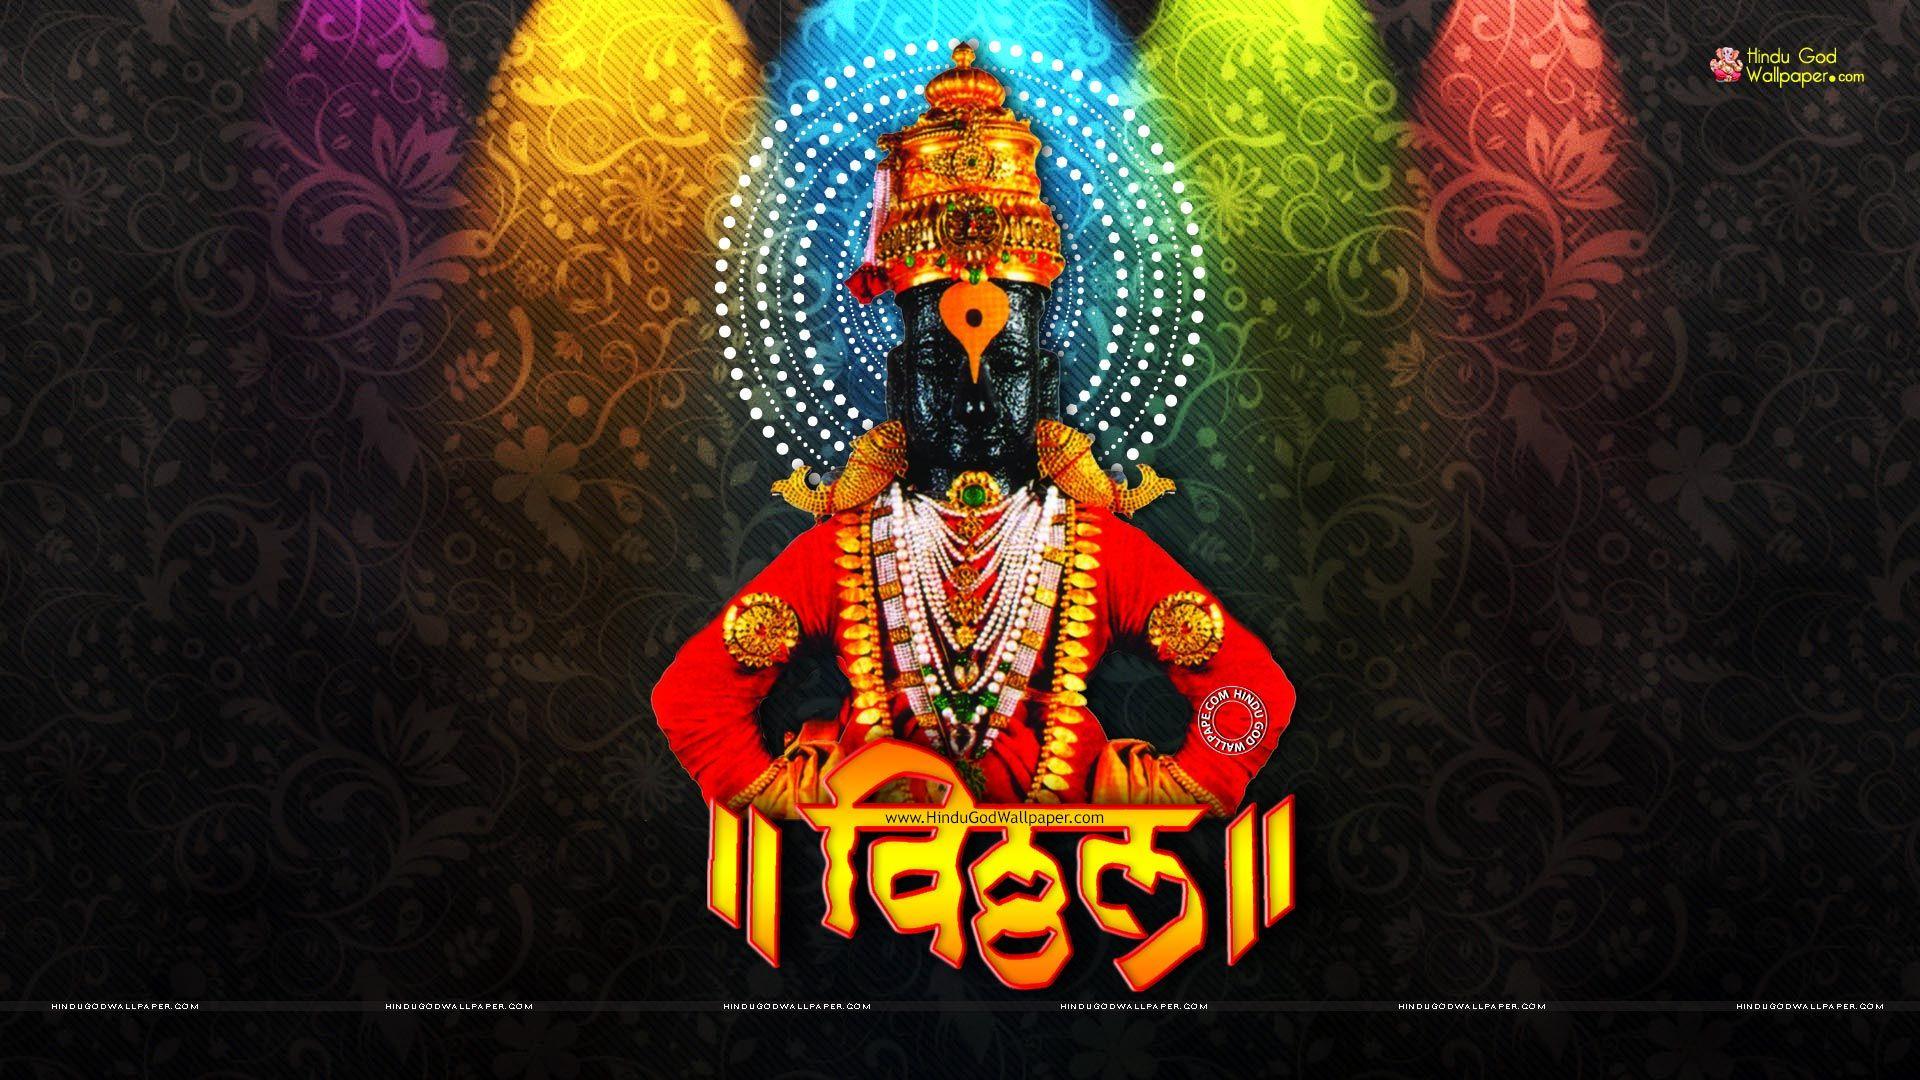 God Vitthal Hd Wallpaper Full Size 1080p Free Download Hd Wallpapers 1080p Hd Wallpaper Indian Flag Wallpaper